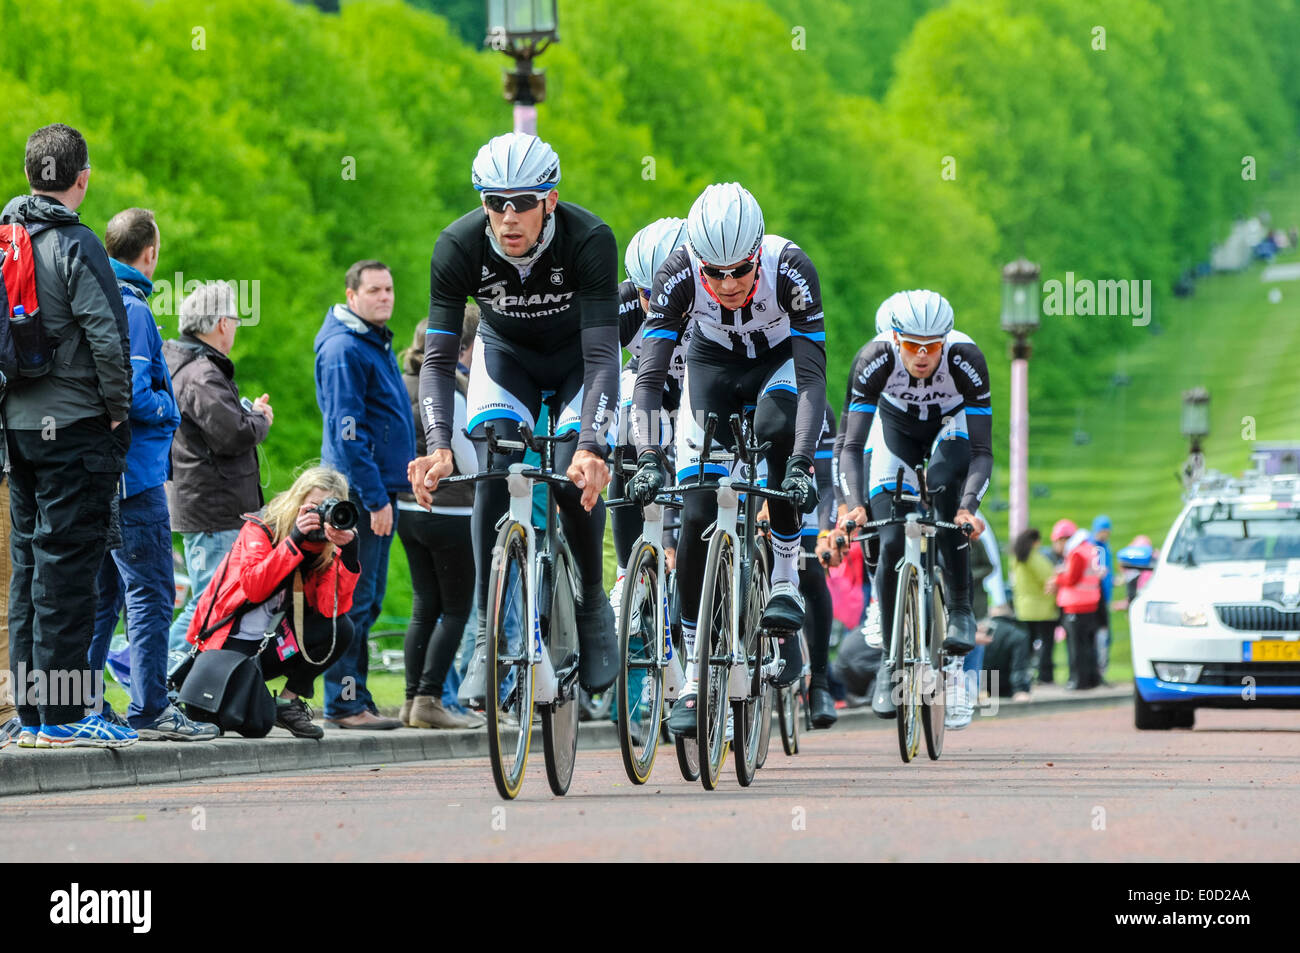 Belfast, Northern Ireland. 9 May 2014 - Giro d'Italia practice session: Giant Shimano (Netherlands) Credit:  Stephen Barnes/Alamy Live News - Stock Image